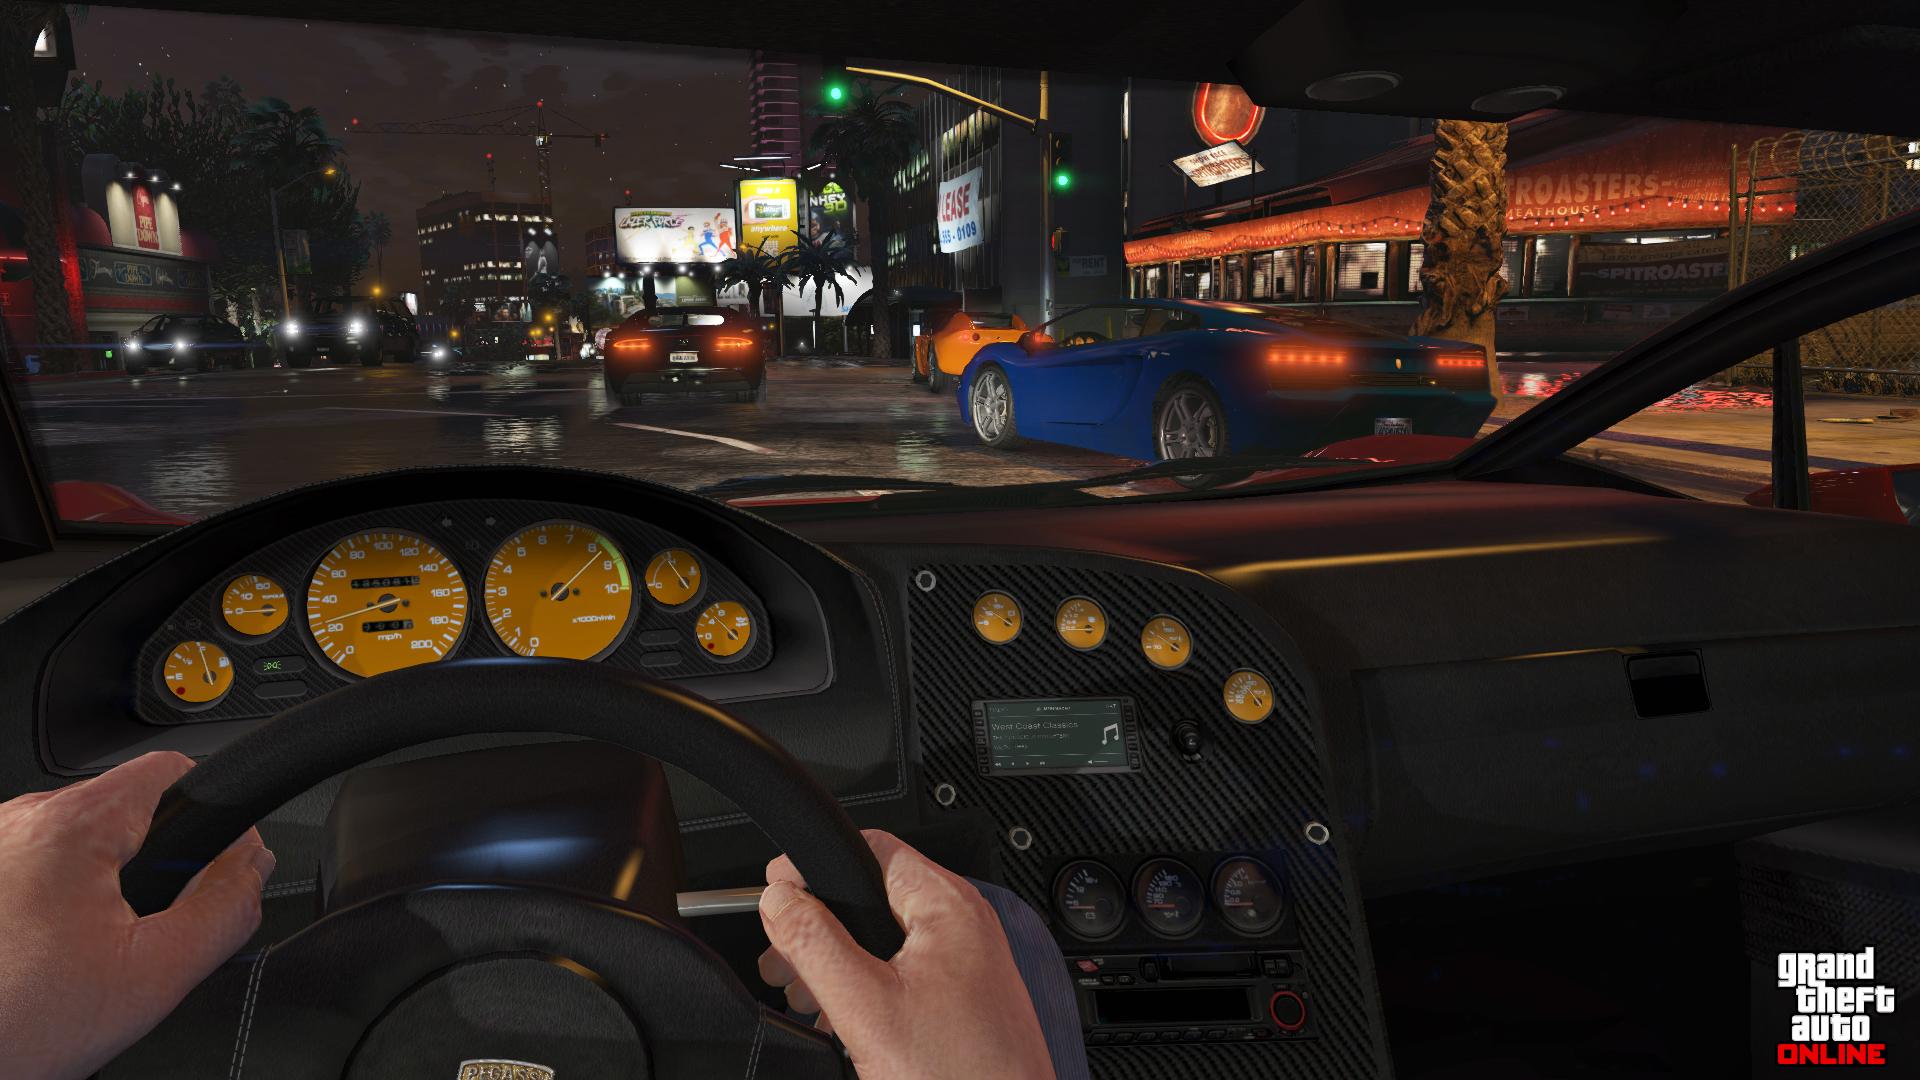 Xbox 360 graphics blurry pictures - dubay 2 bozbash pictures hacikend